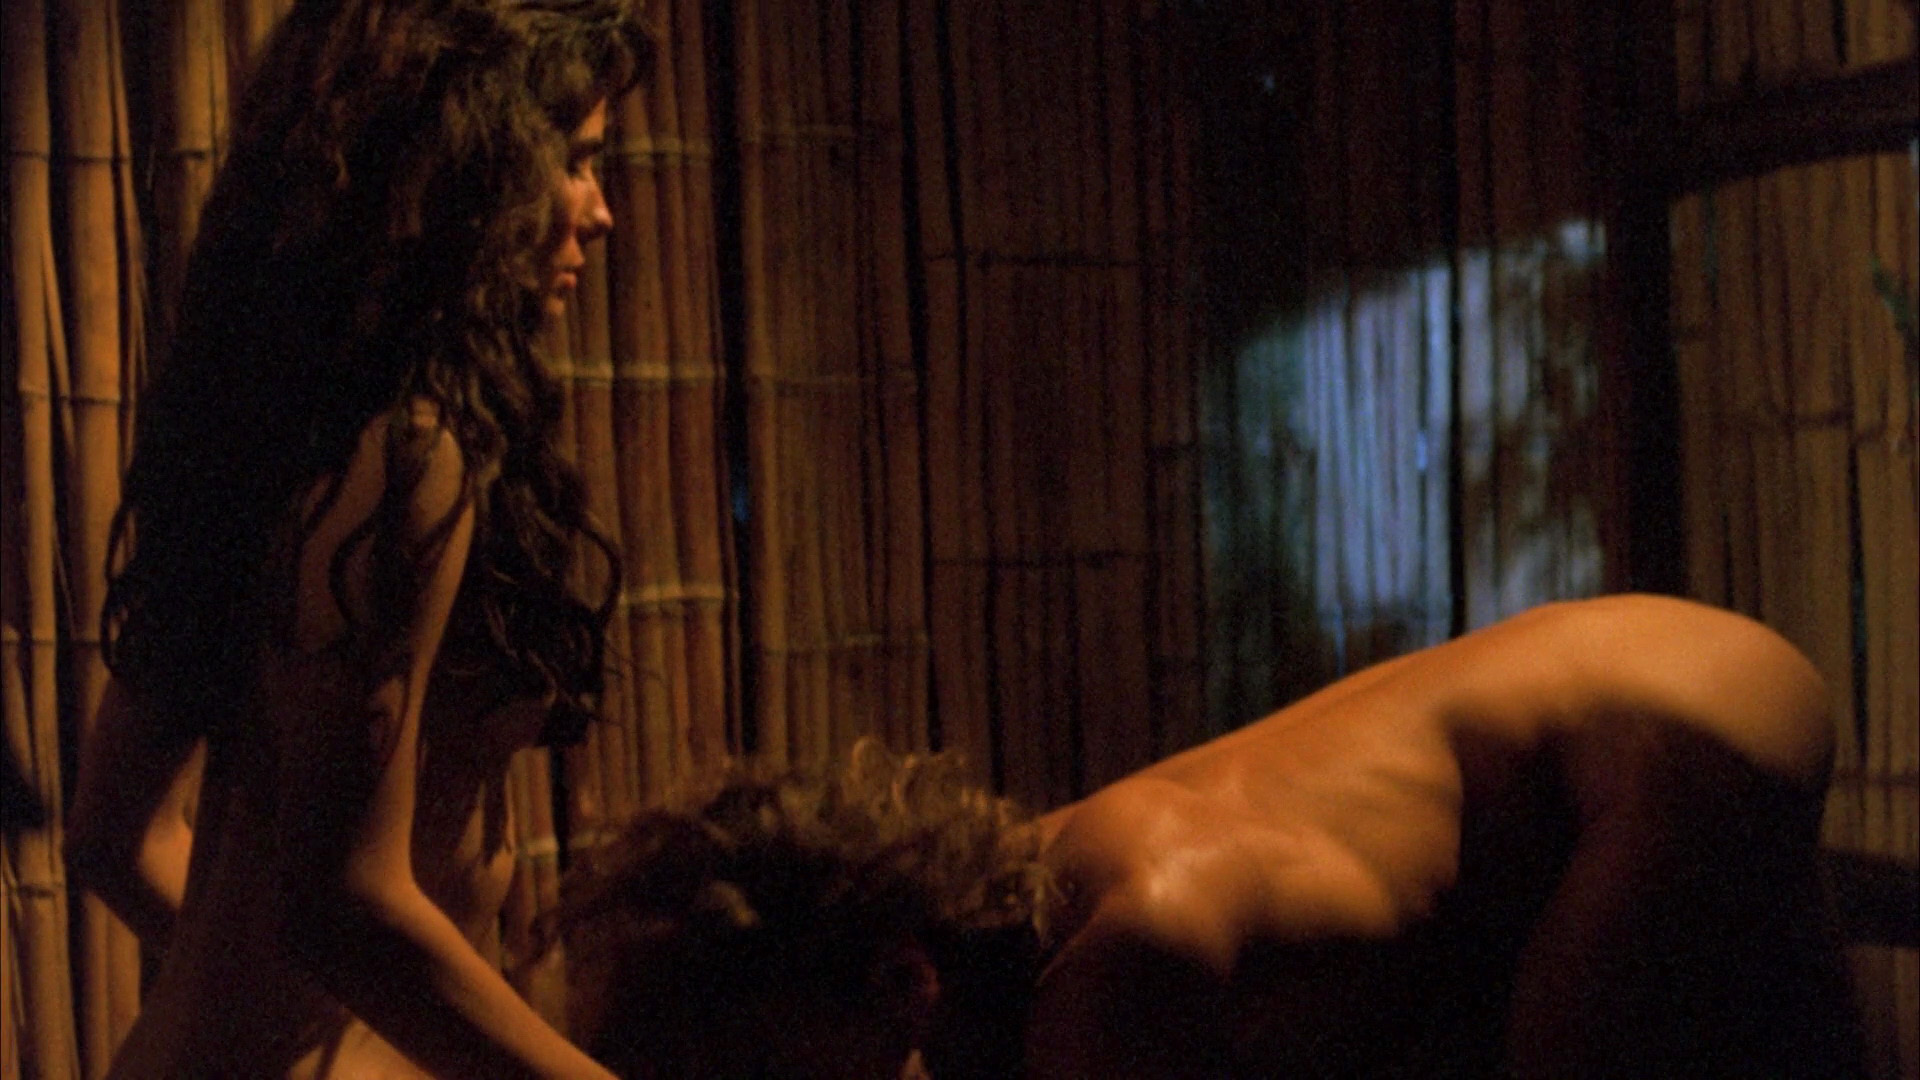 Fire on the amazon nude scene